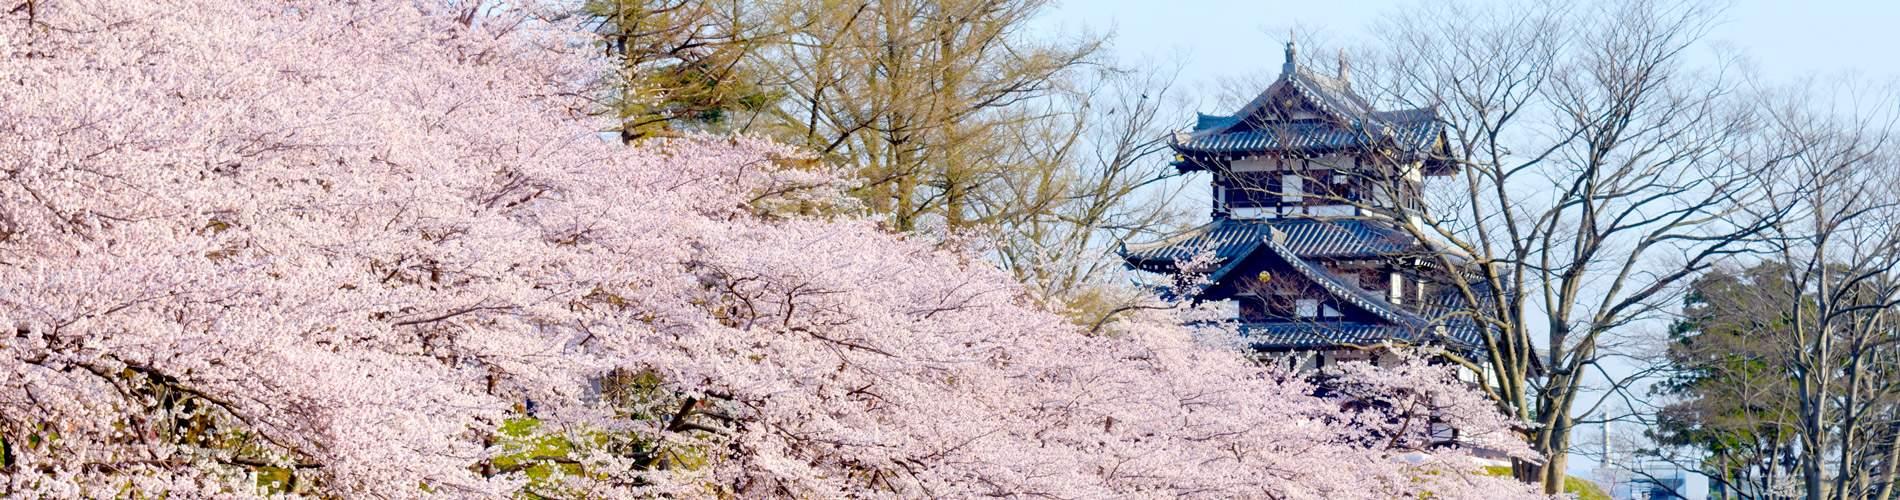 上越 高田城の桜